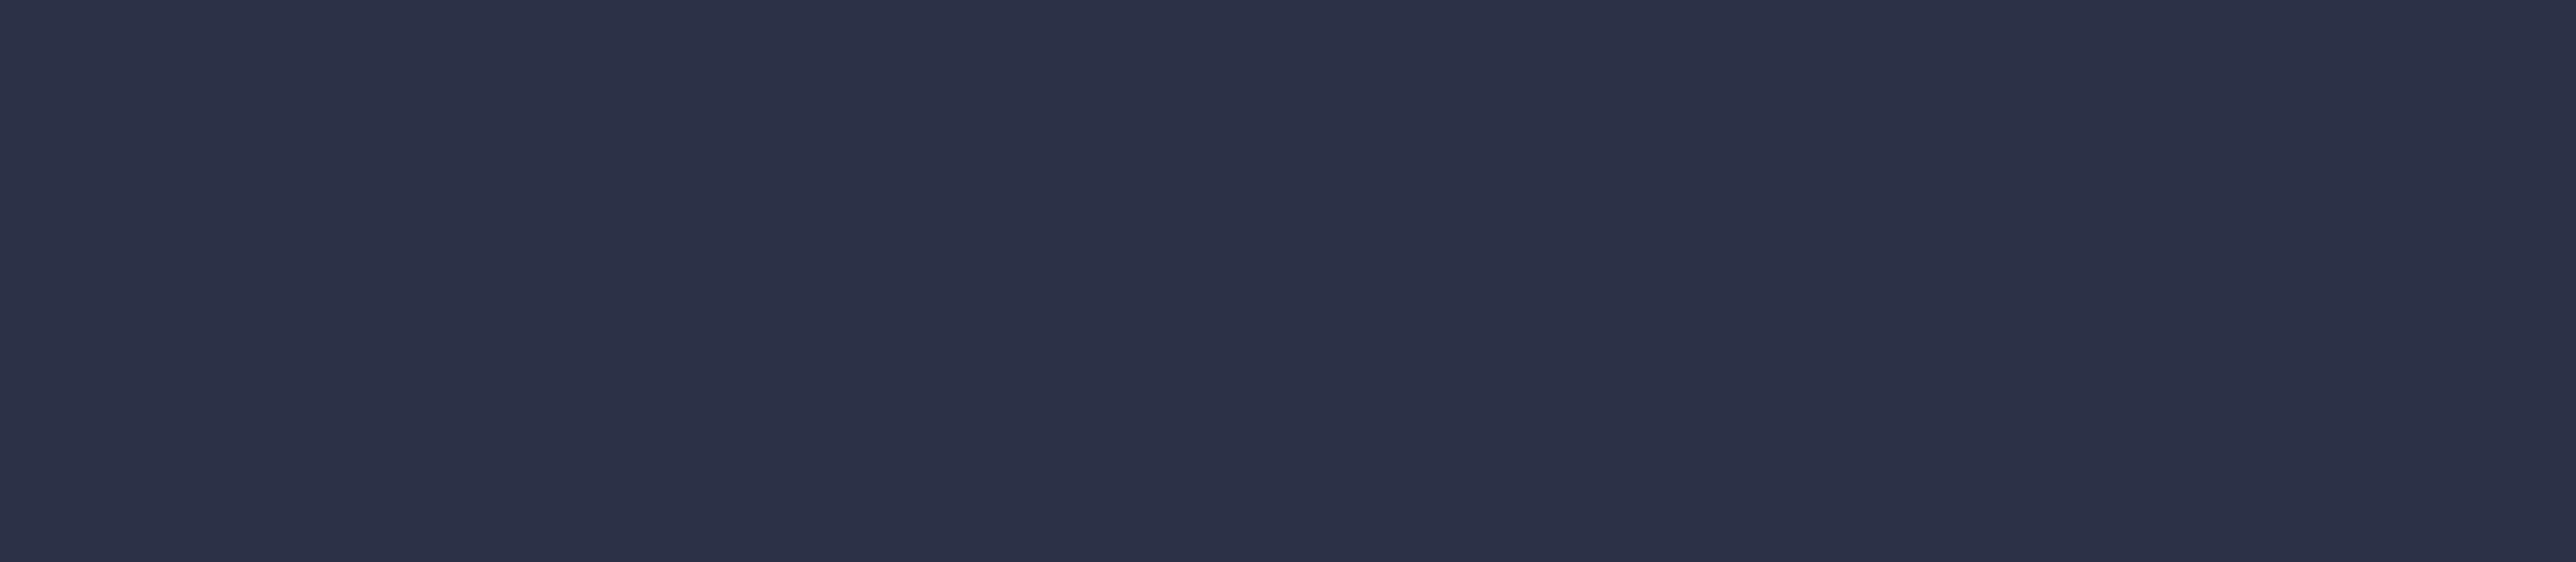 Car Hauler Truck Driving Jobs.